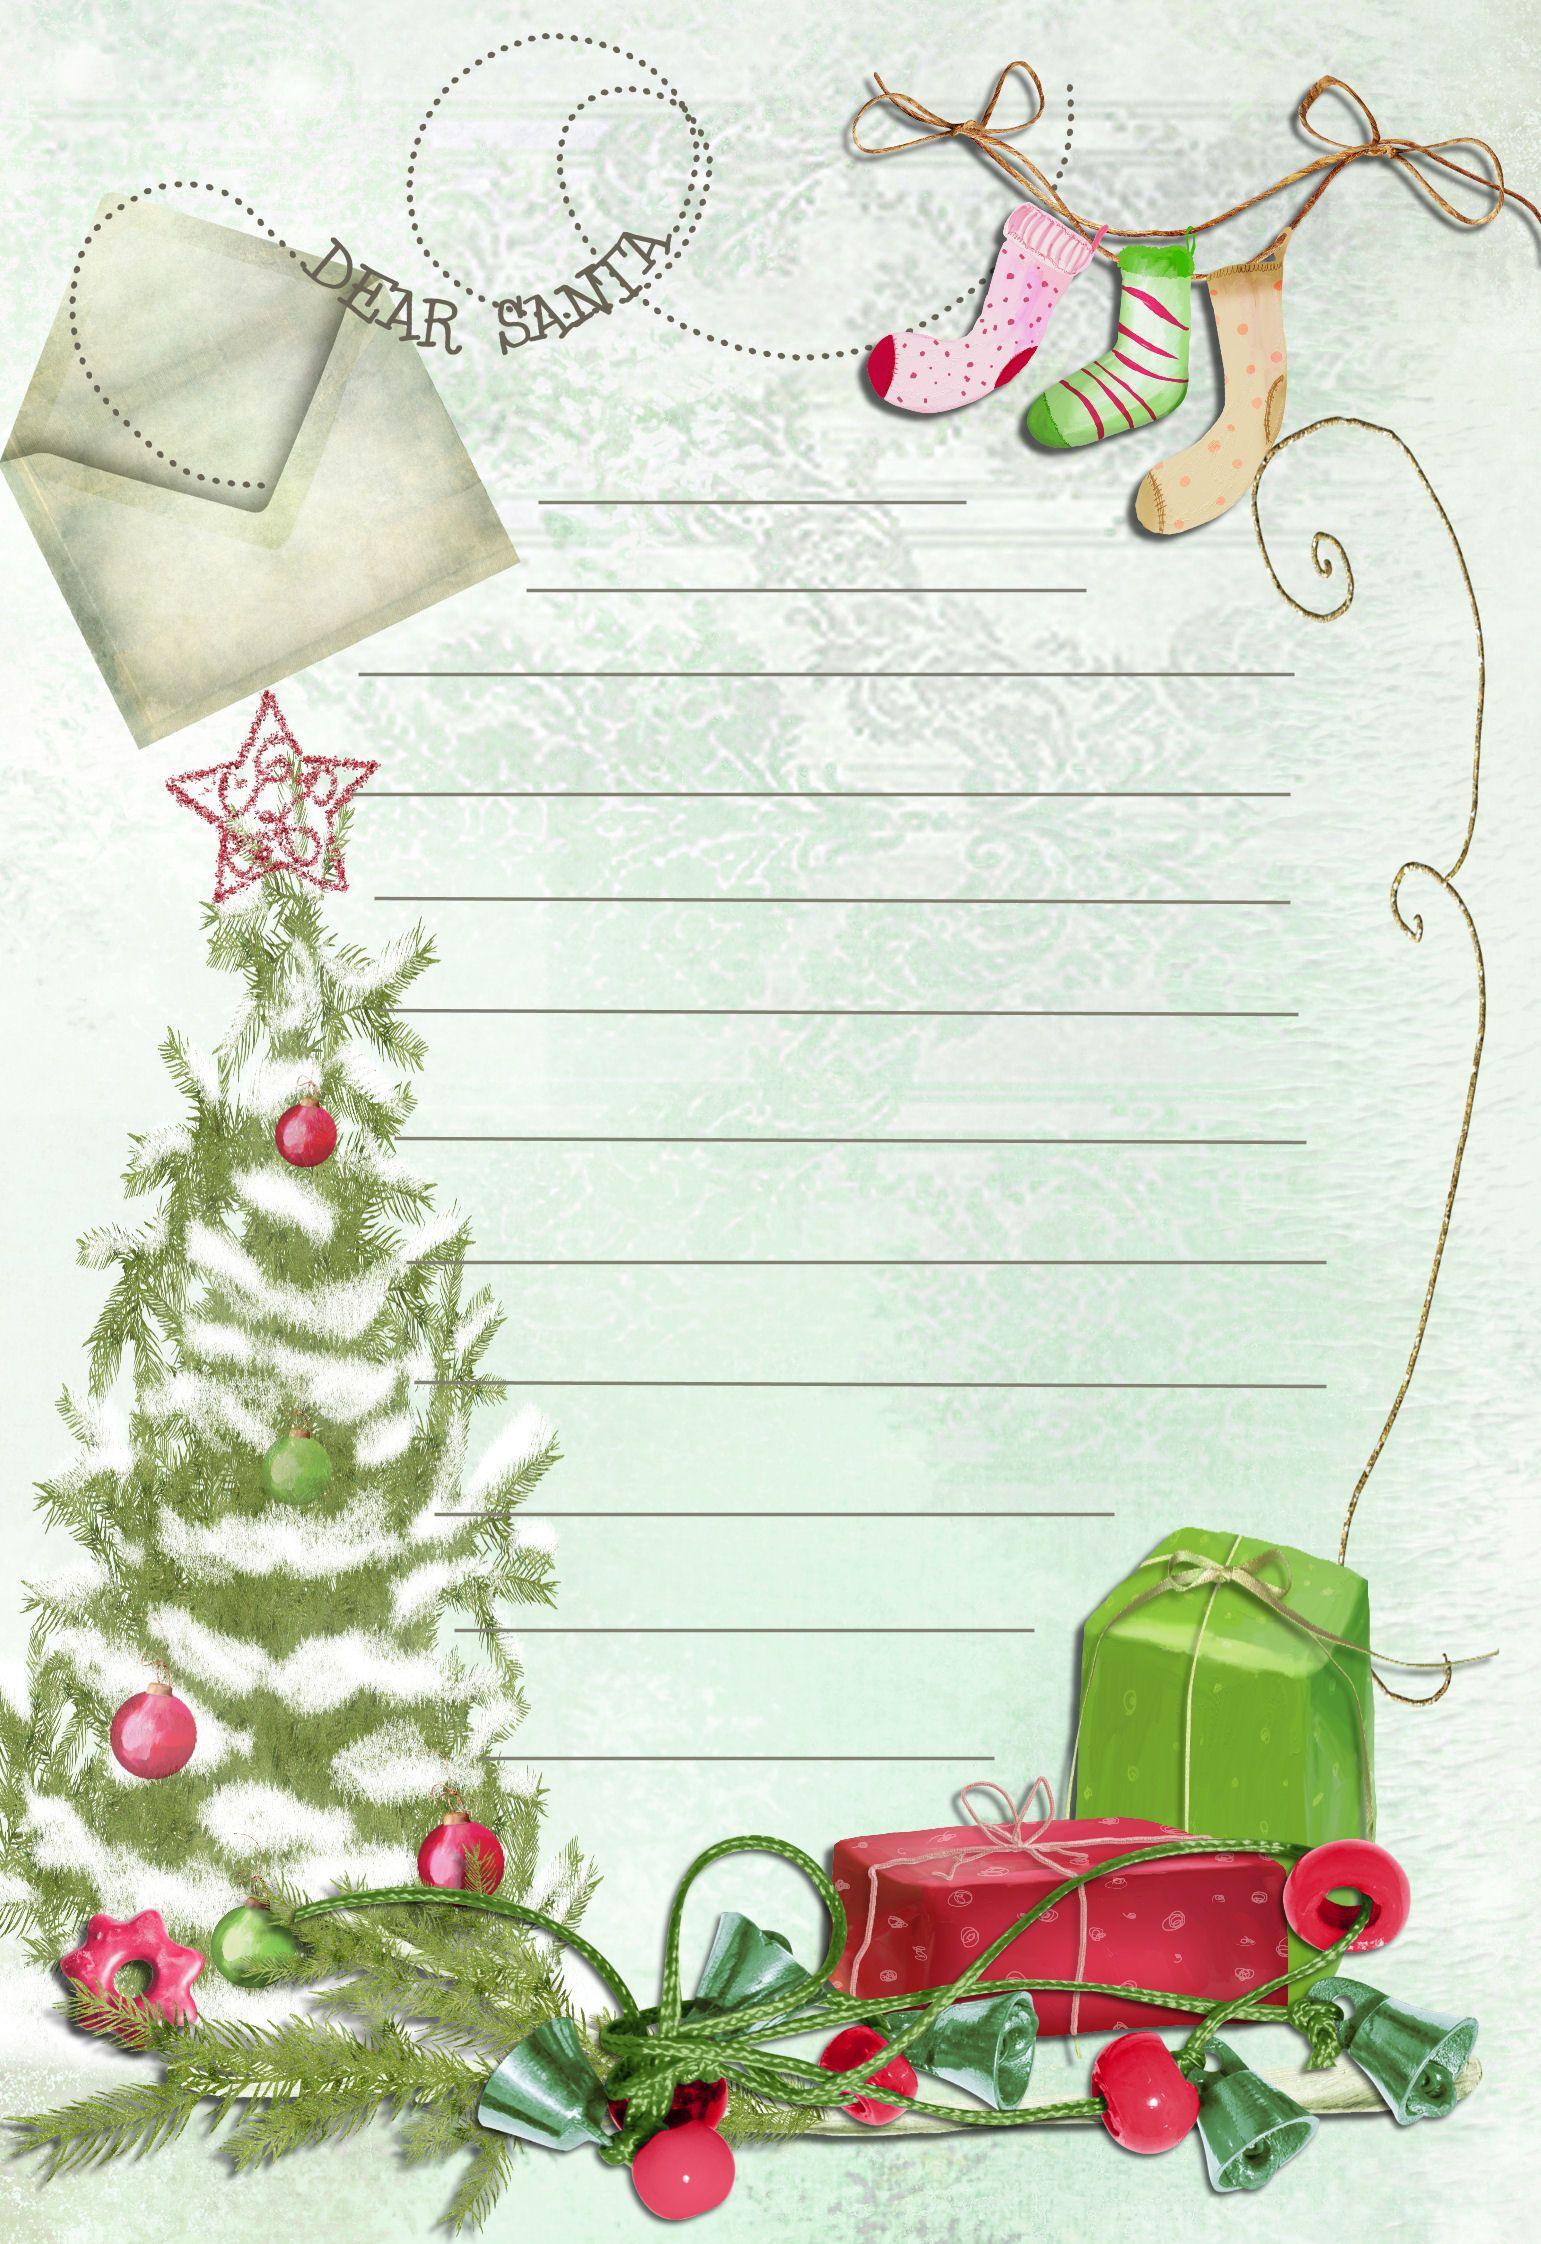 Free Christmas Letter Templates Printable Yfgit